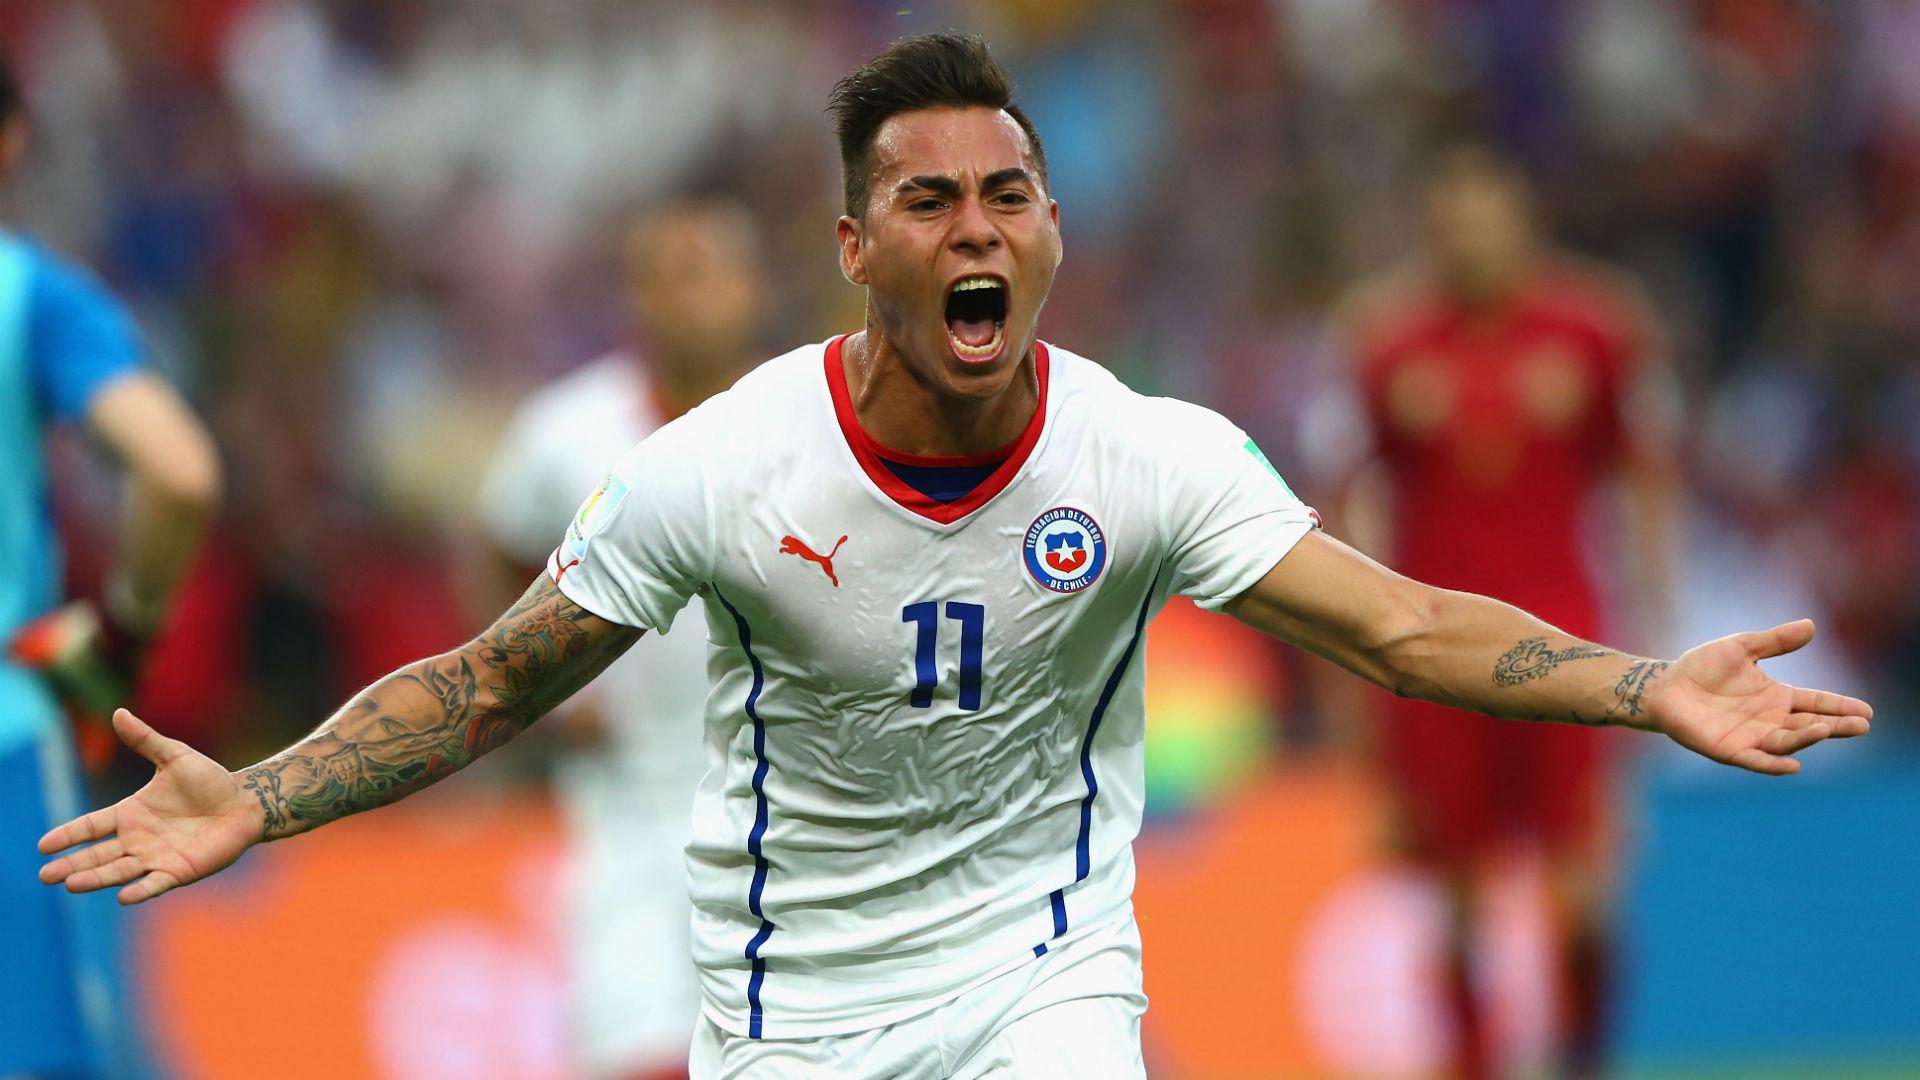 Vargas fora da Premier League